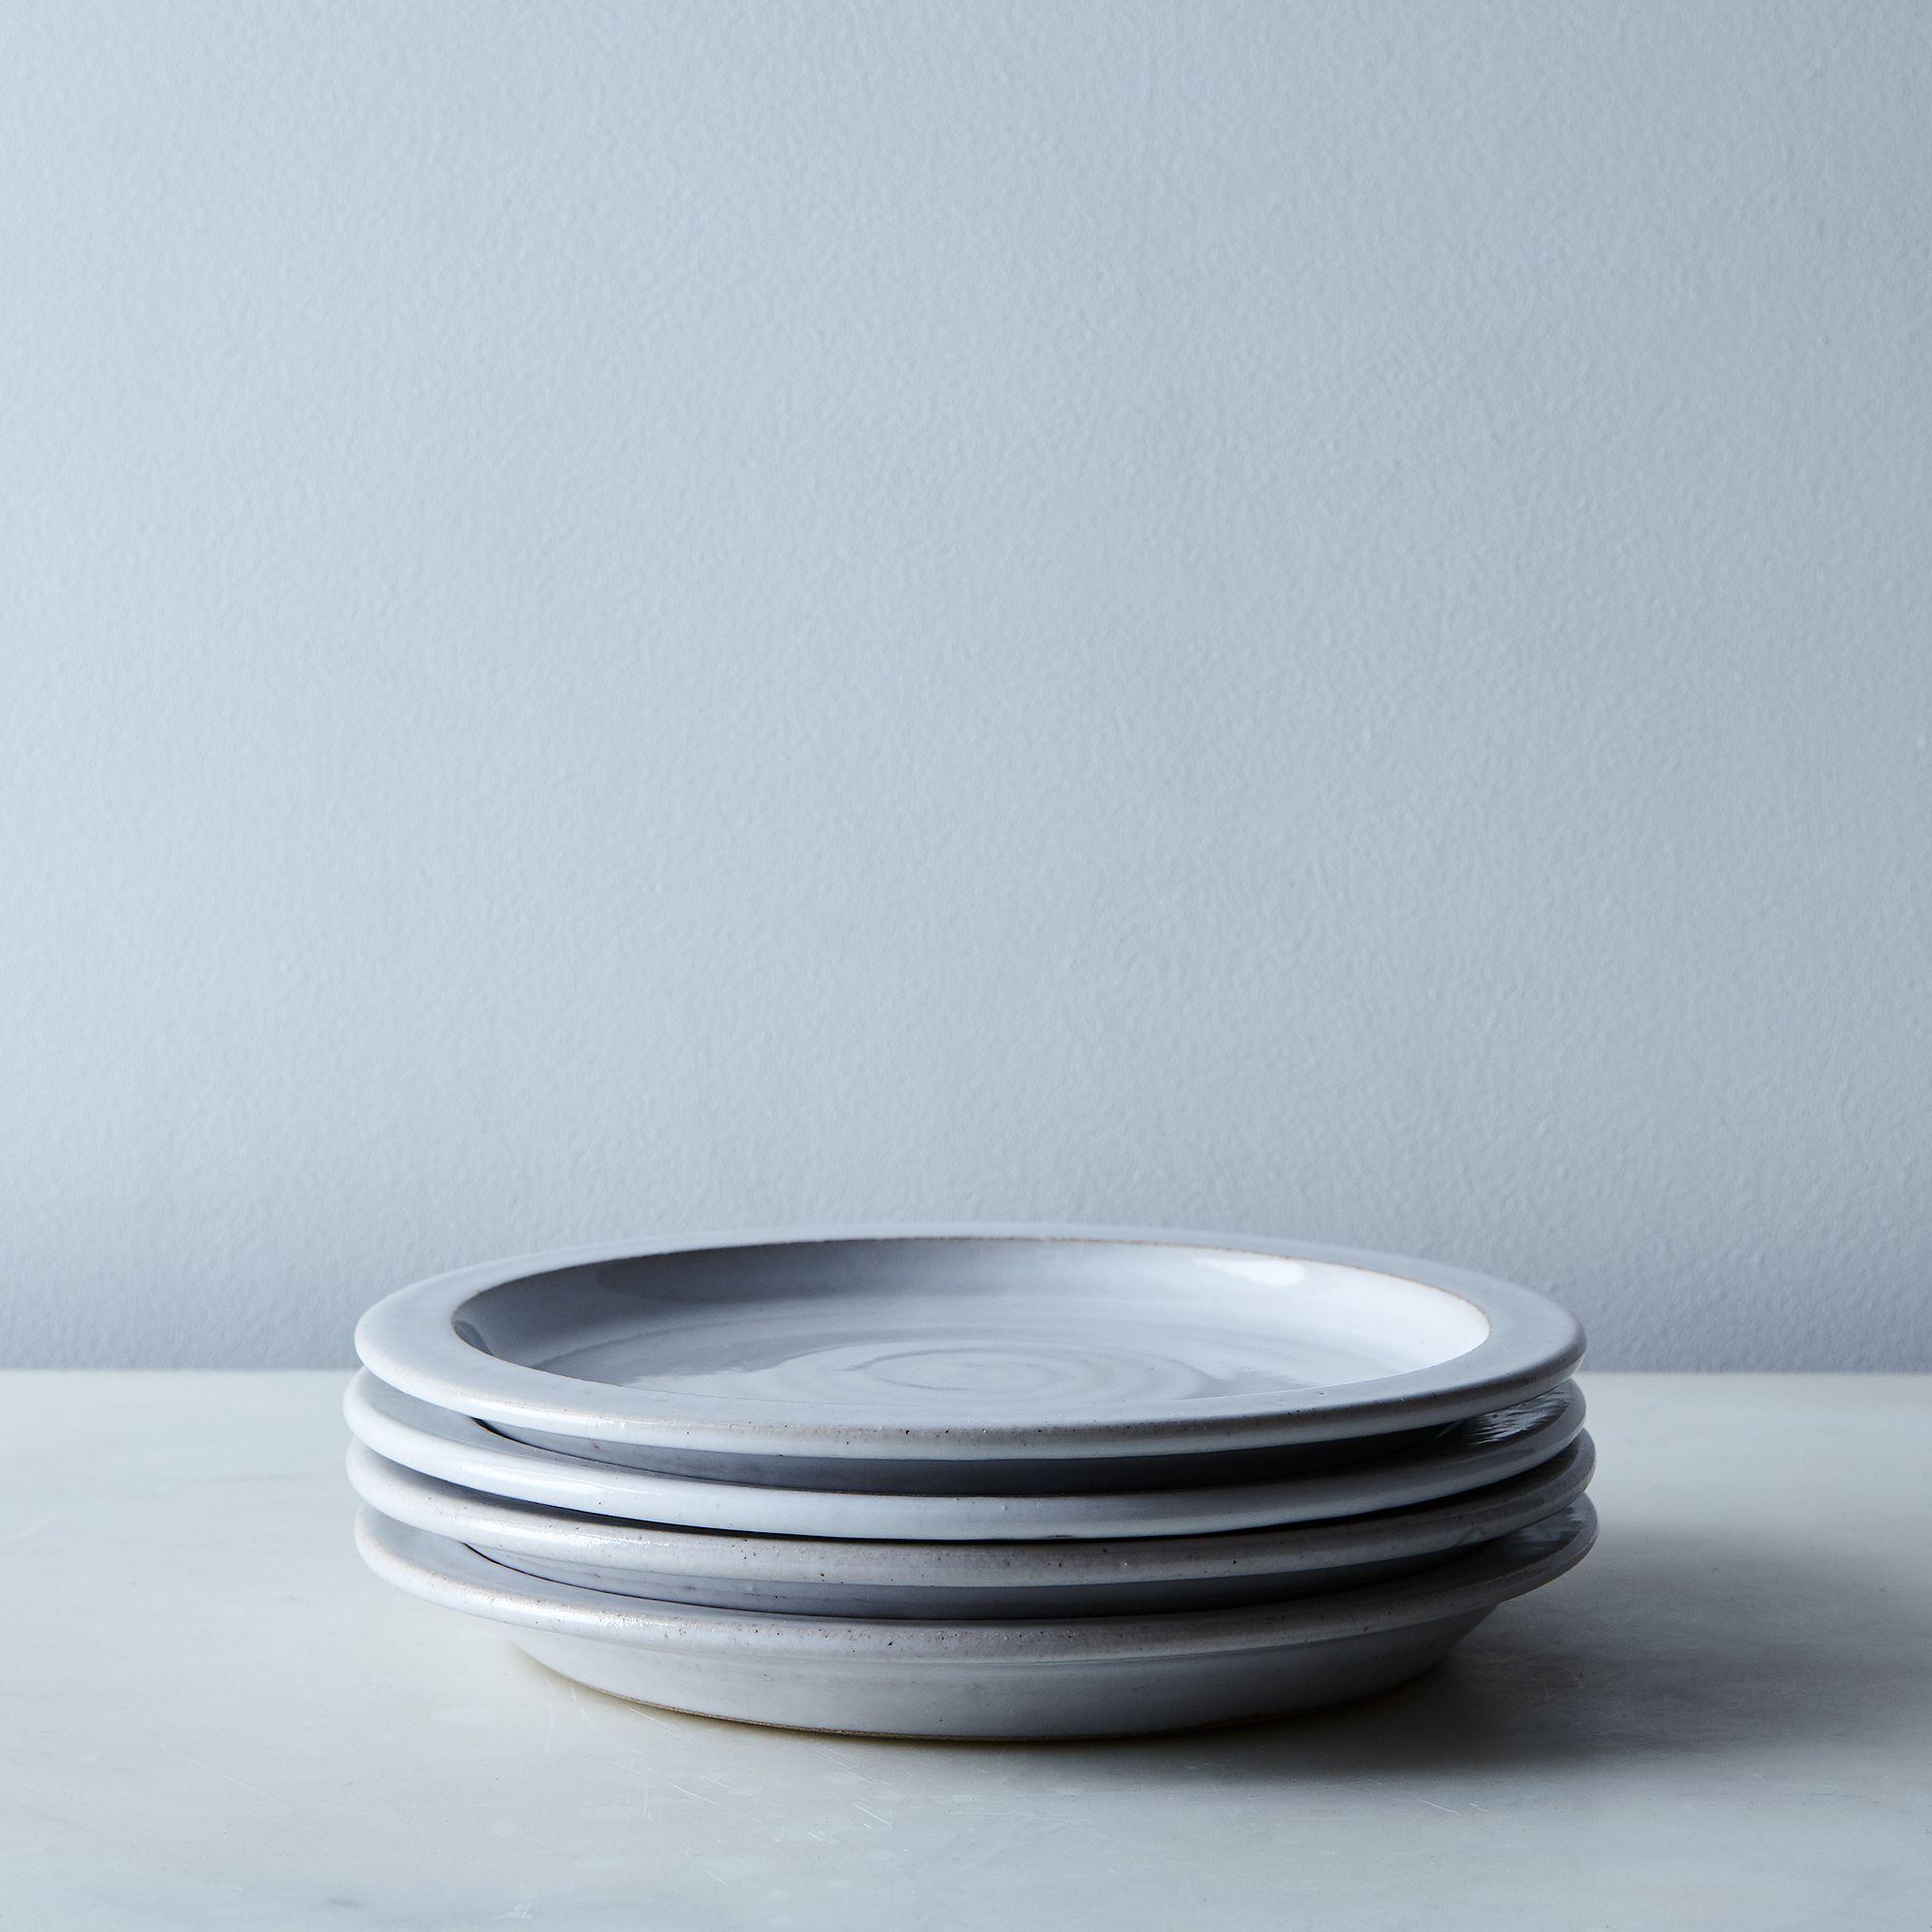 85a3d0dc bae3 4d5e 9ee9 bfdac5ef543e  2017 0315 farmhouse pottery handmade farmhouse dinnerware individual salad plate set of 4 silo rocky luten 001